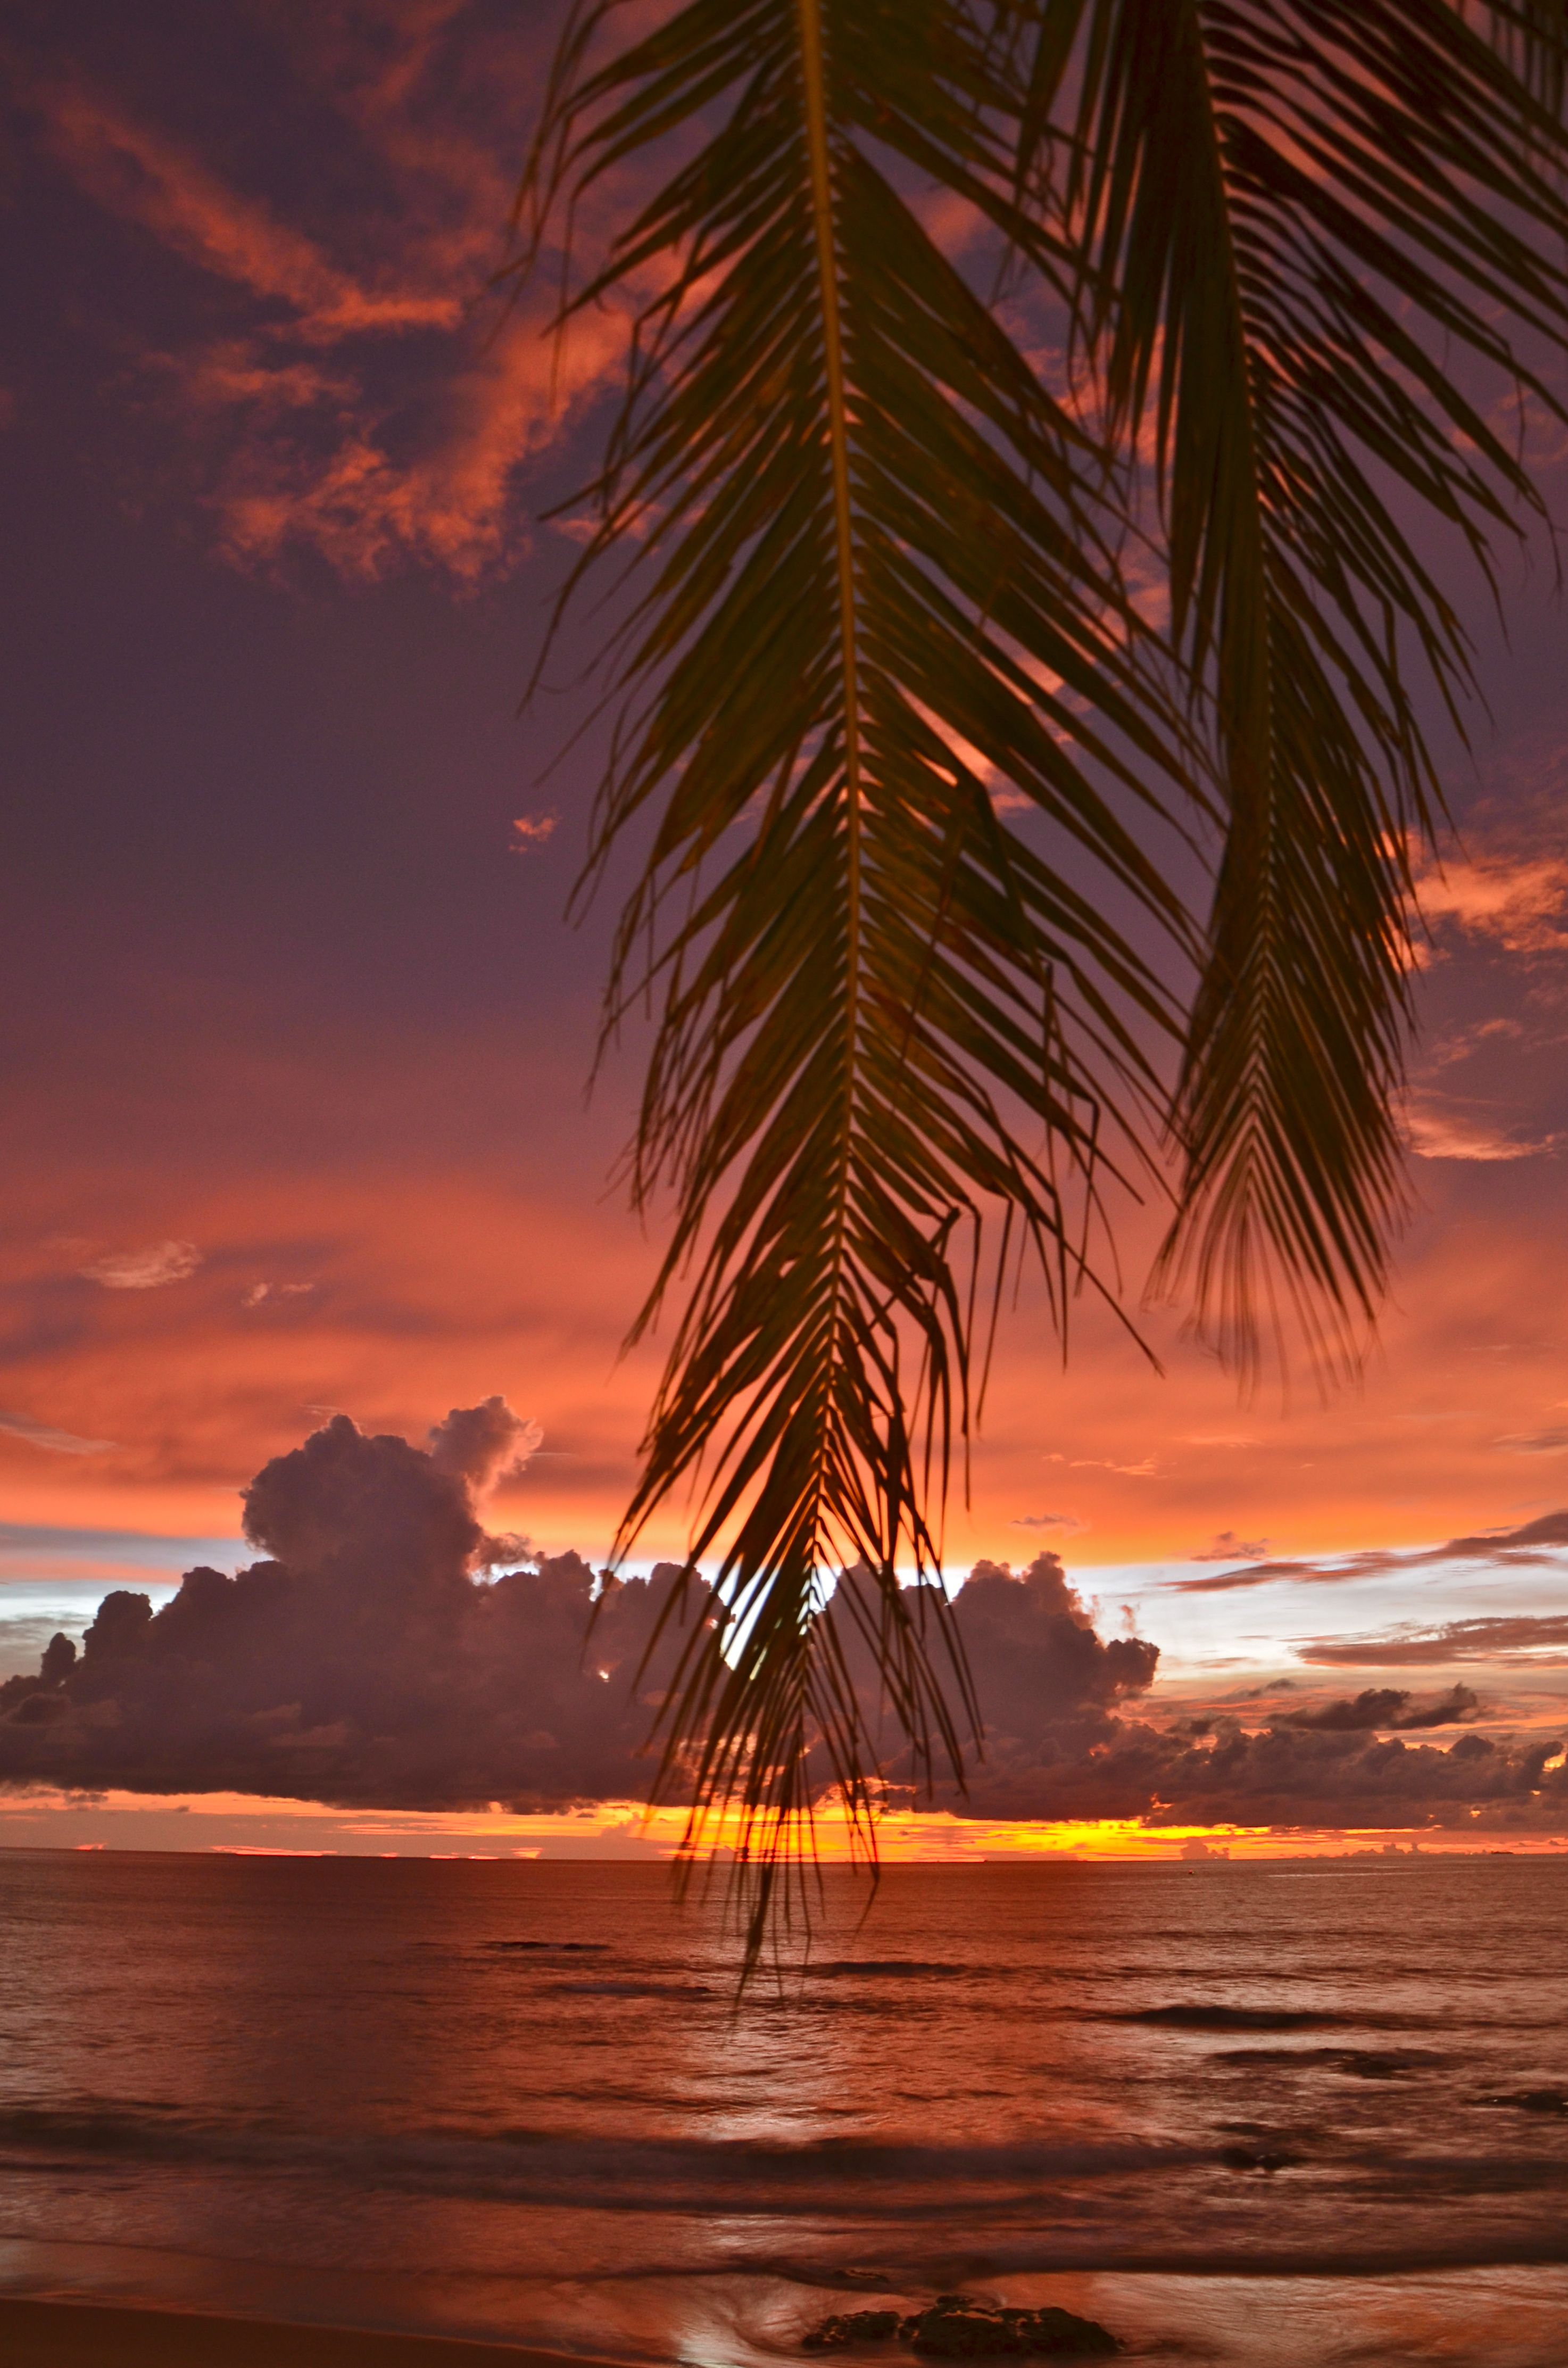 Really magic sunsets at Kamala Beach, Phuket, Thailand. With love ...